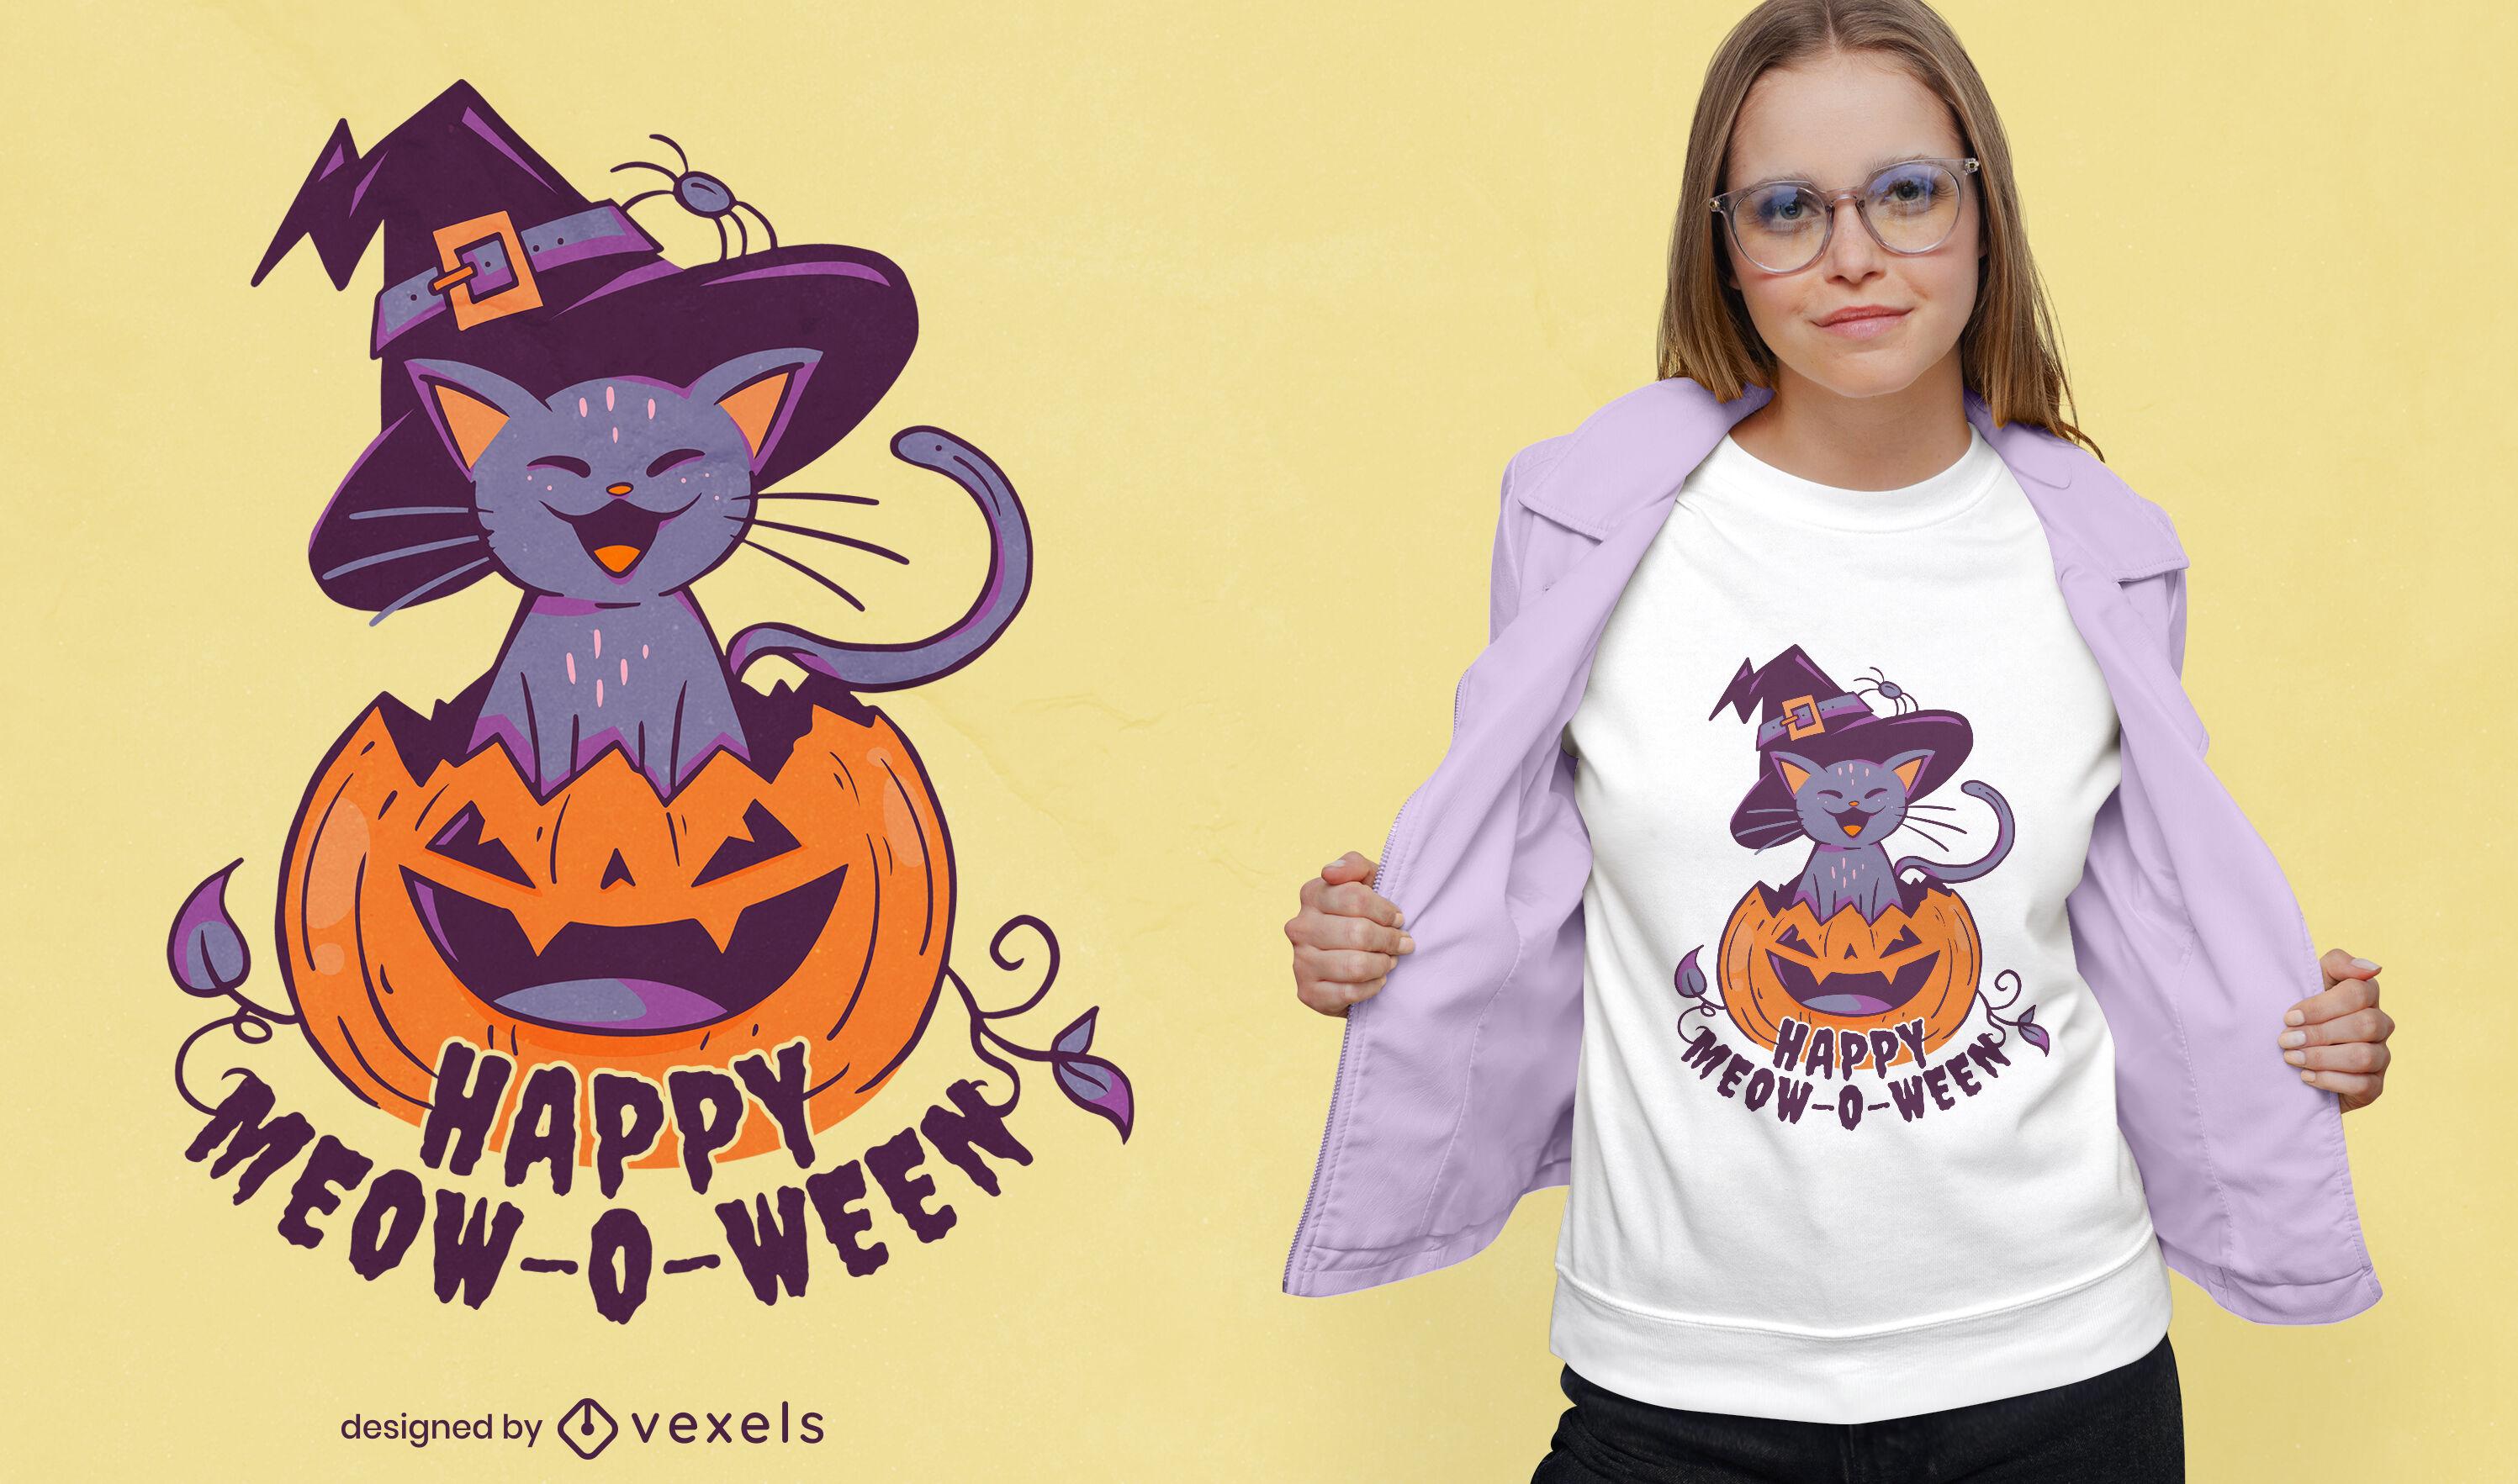 S??e Katze im K?rbis-Halloween-T-Shirt-Design